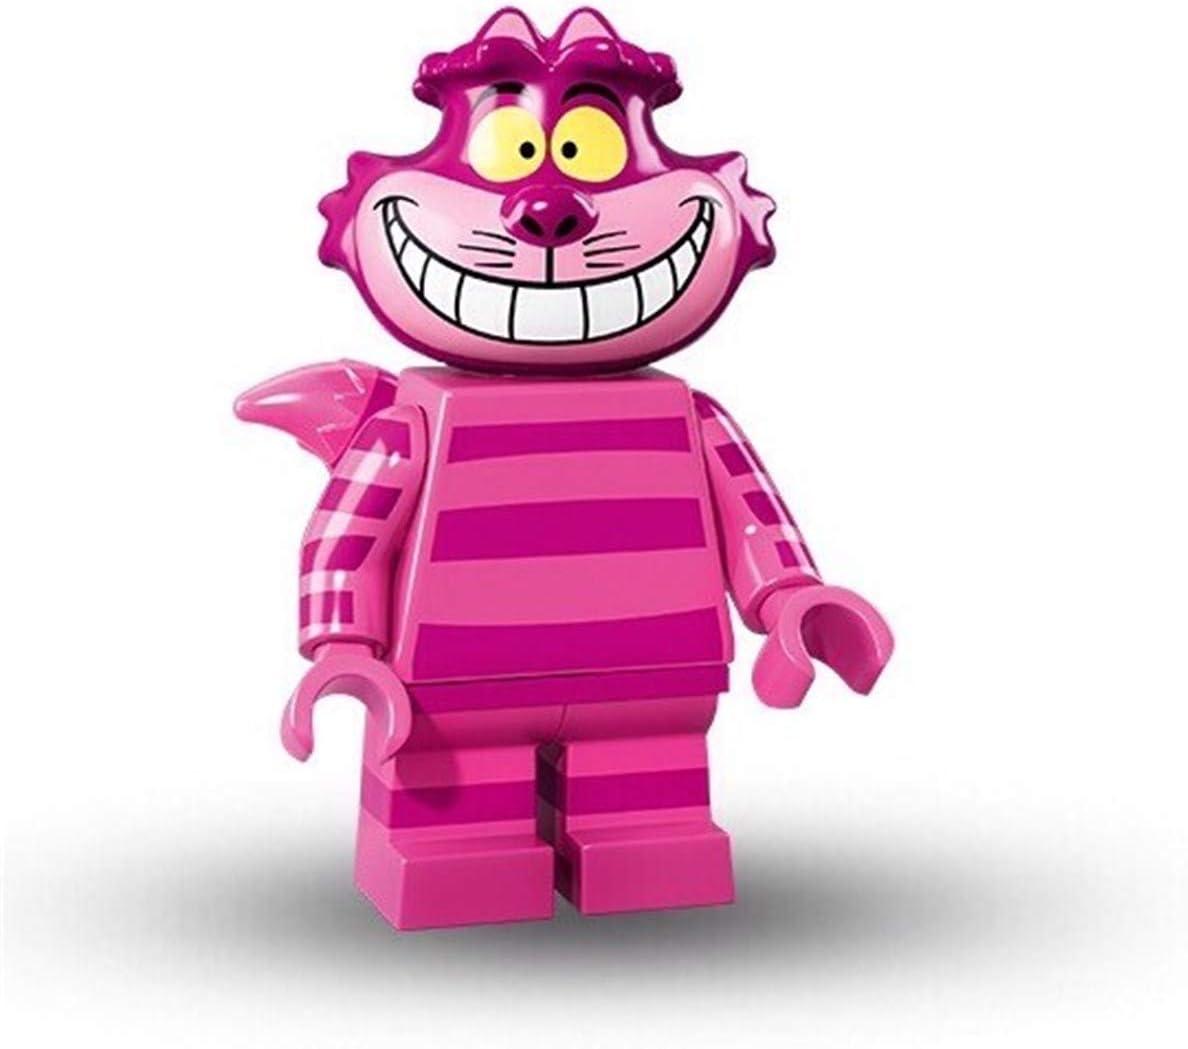 New LEGO Minifigures Disney Series 71012 Alice in Wonderland